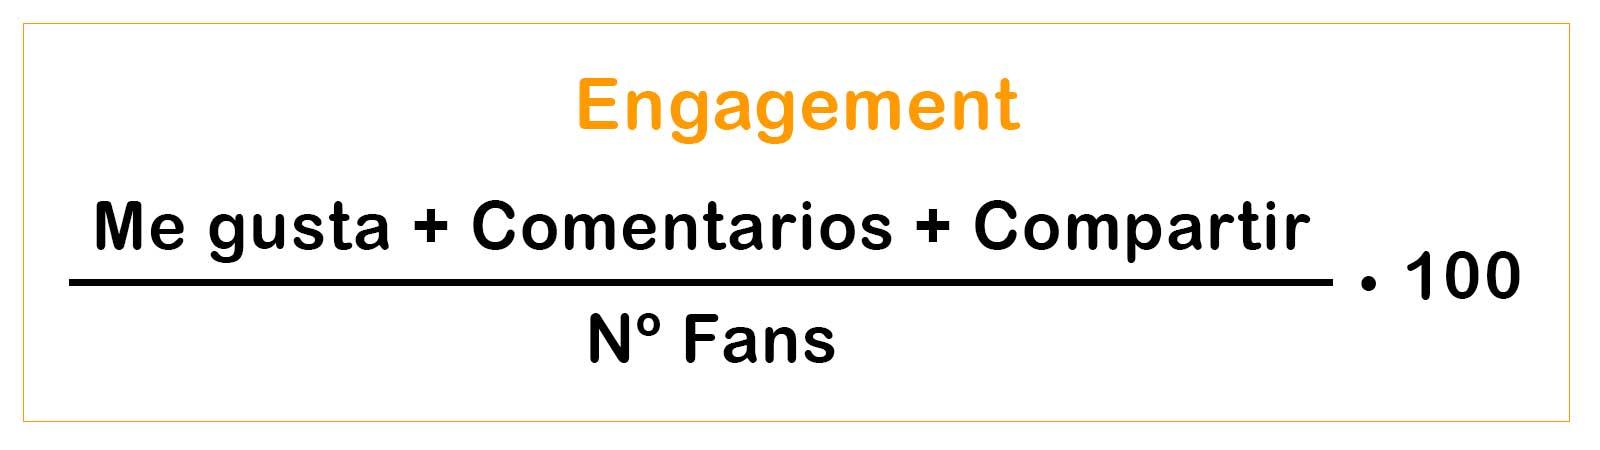 Cómo calcular engagement en RRSS